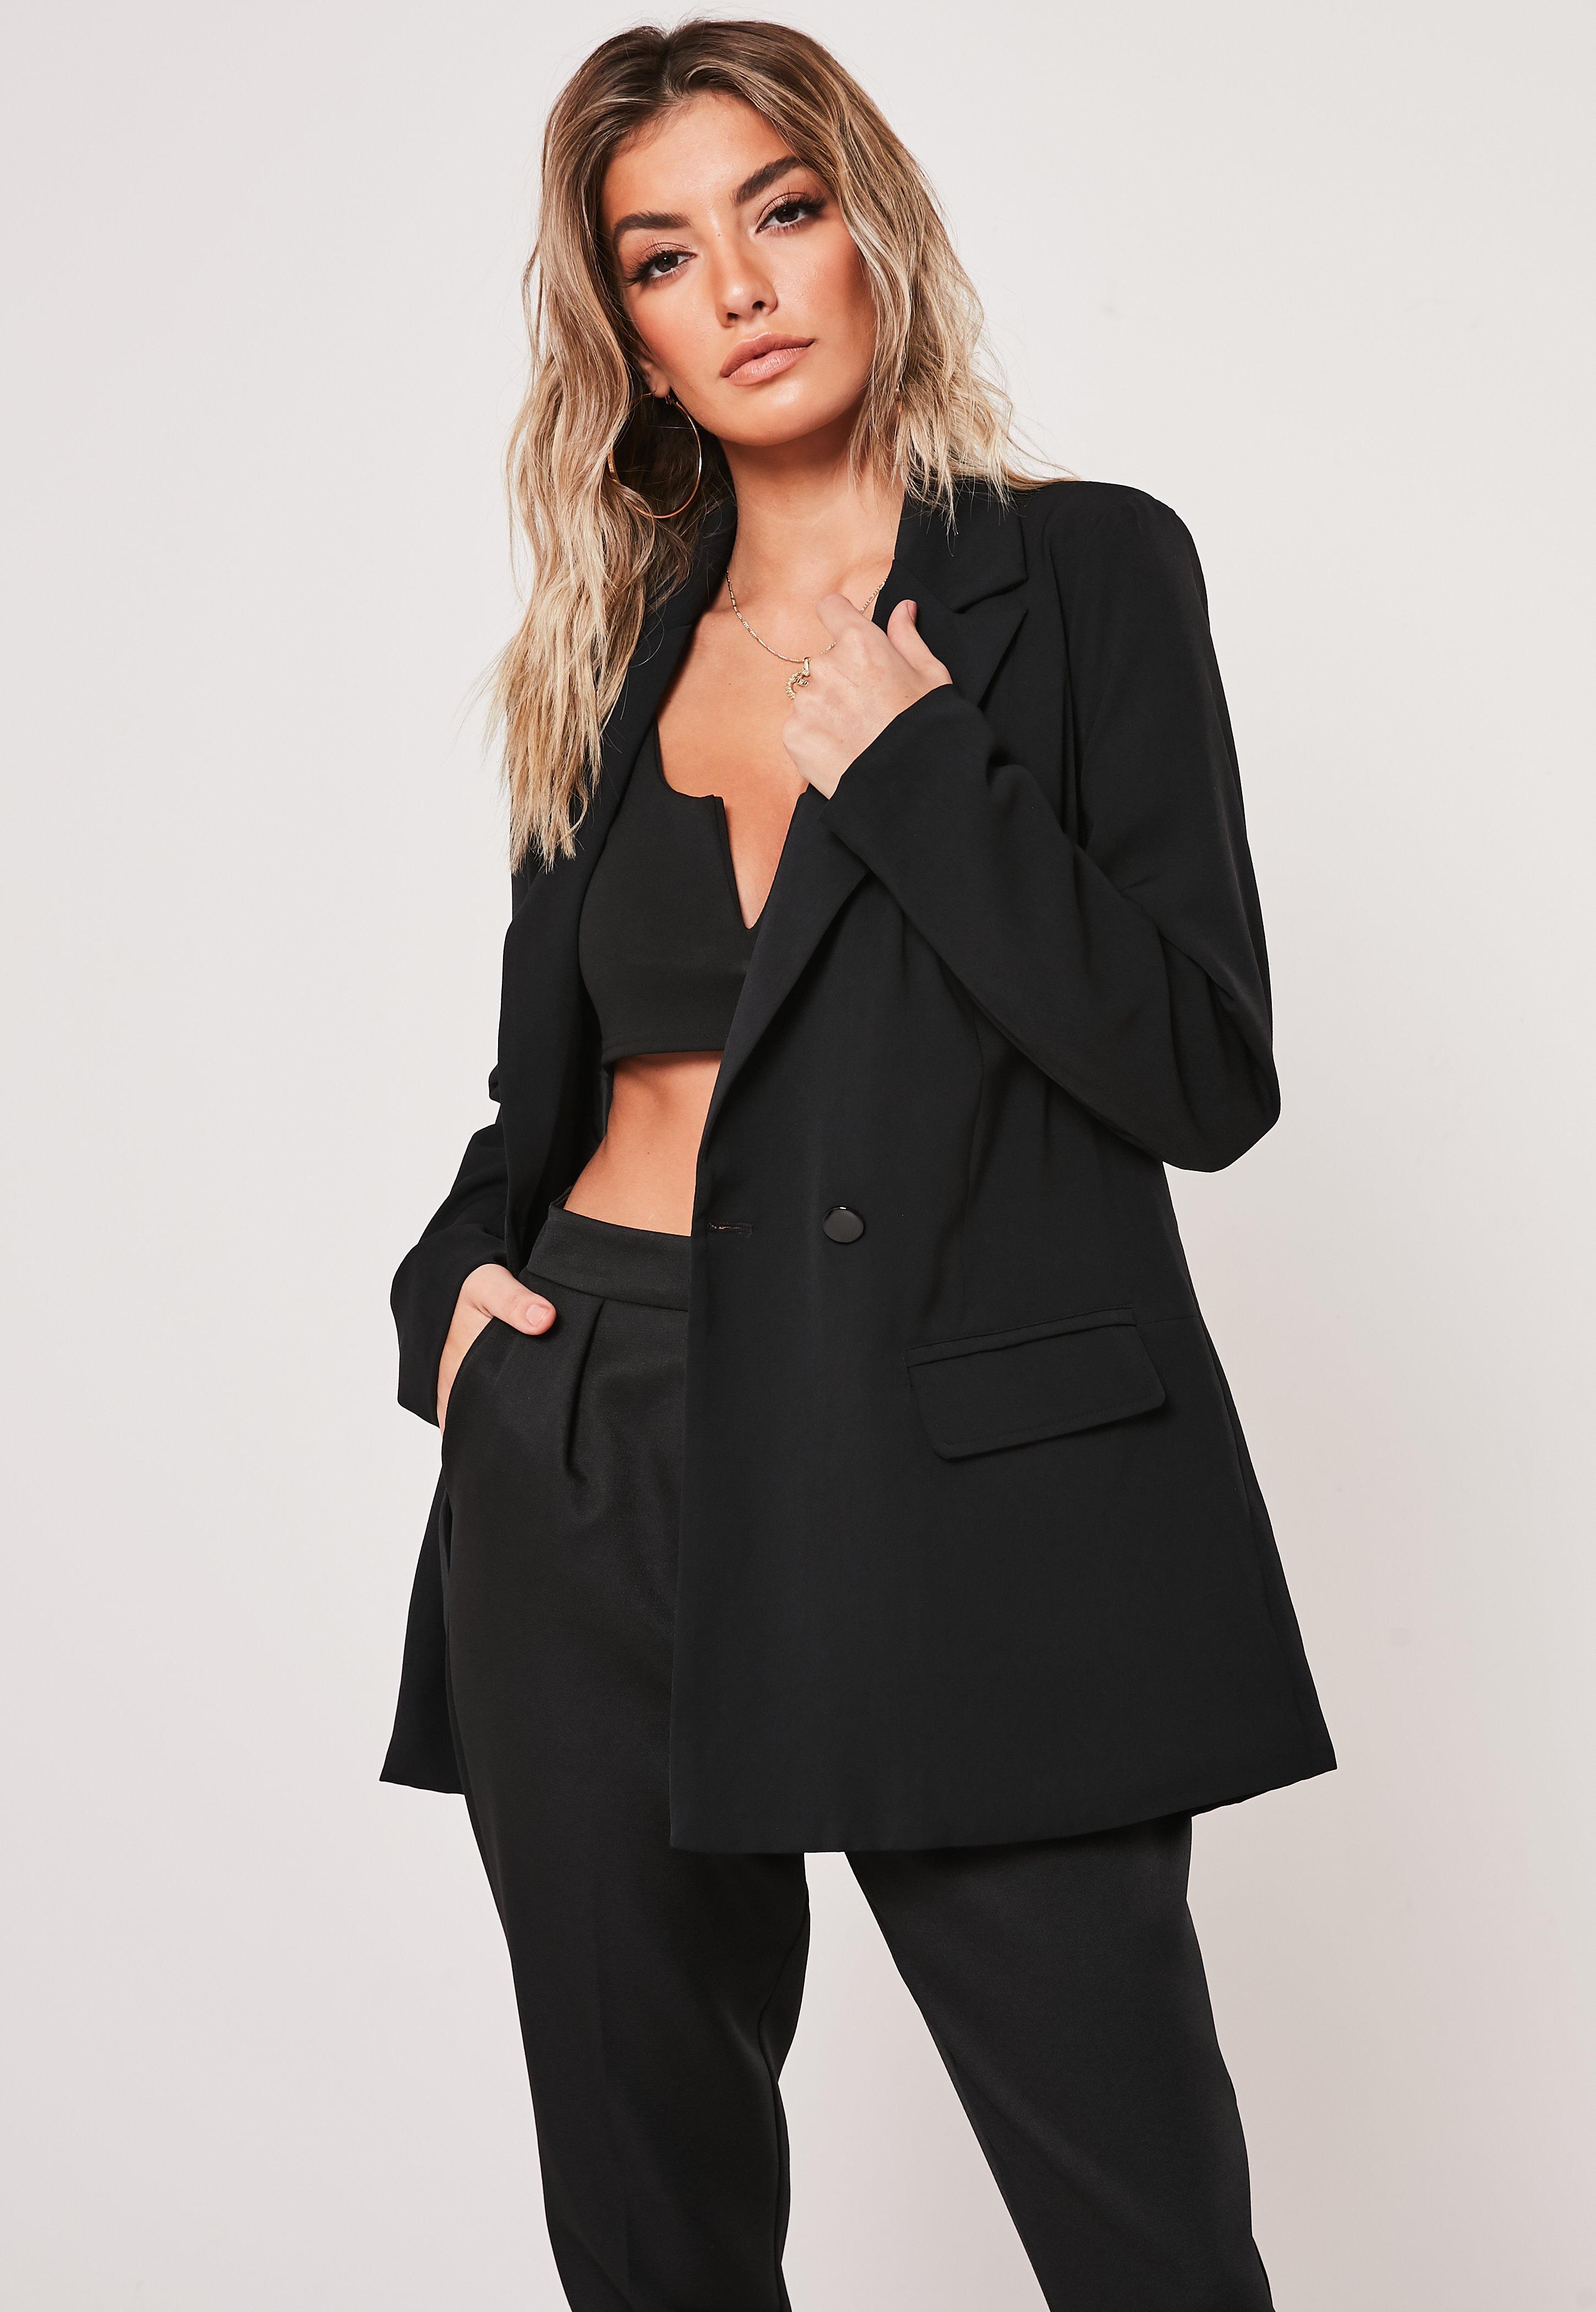 49928b125c Blazer - Achat blazer pour femme en ligne - Missguided